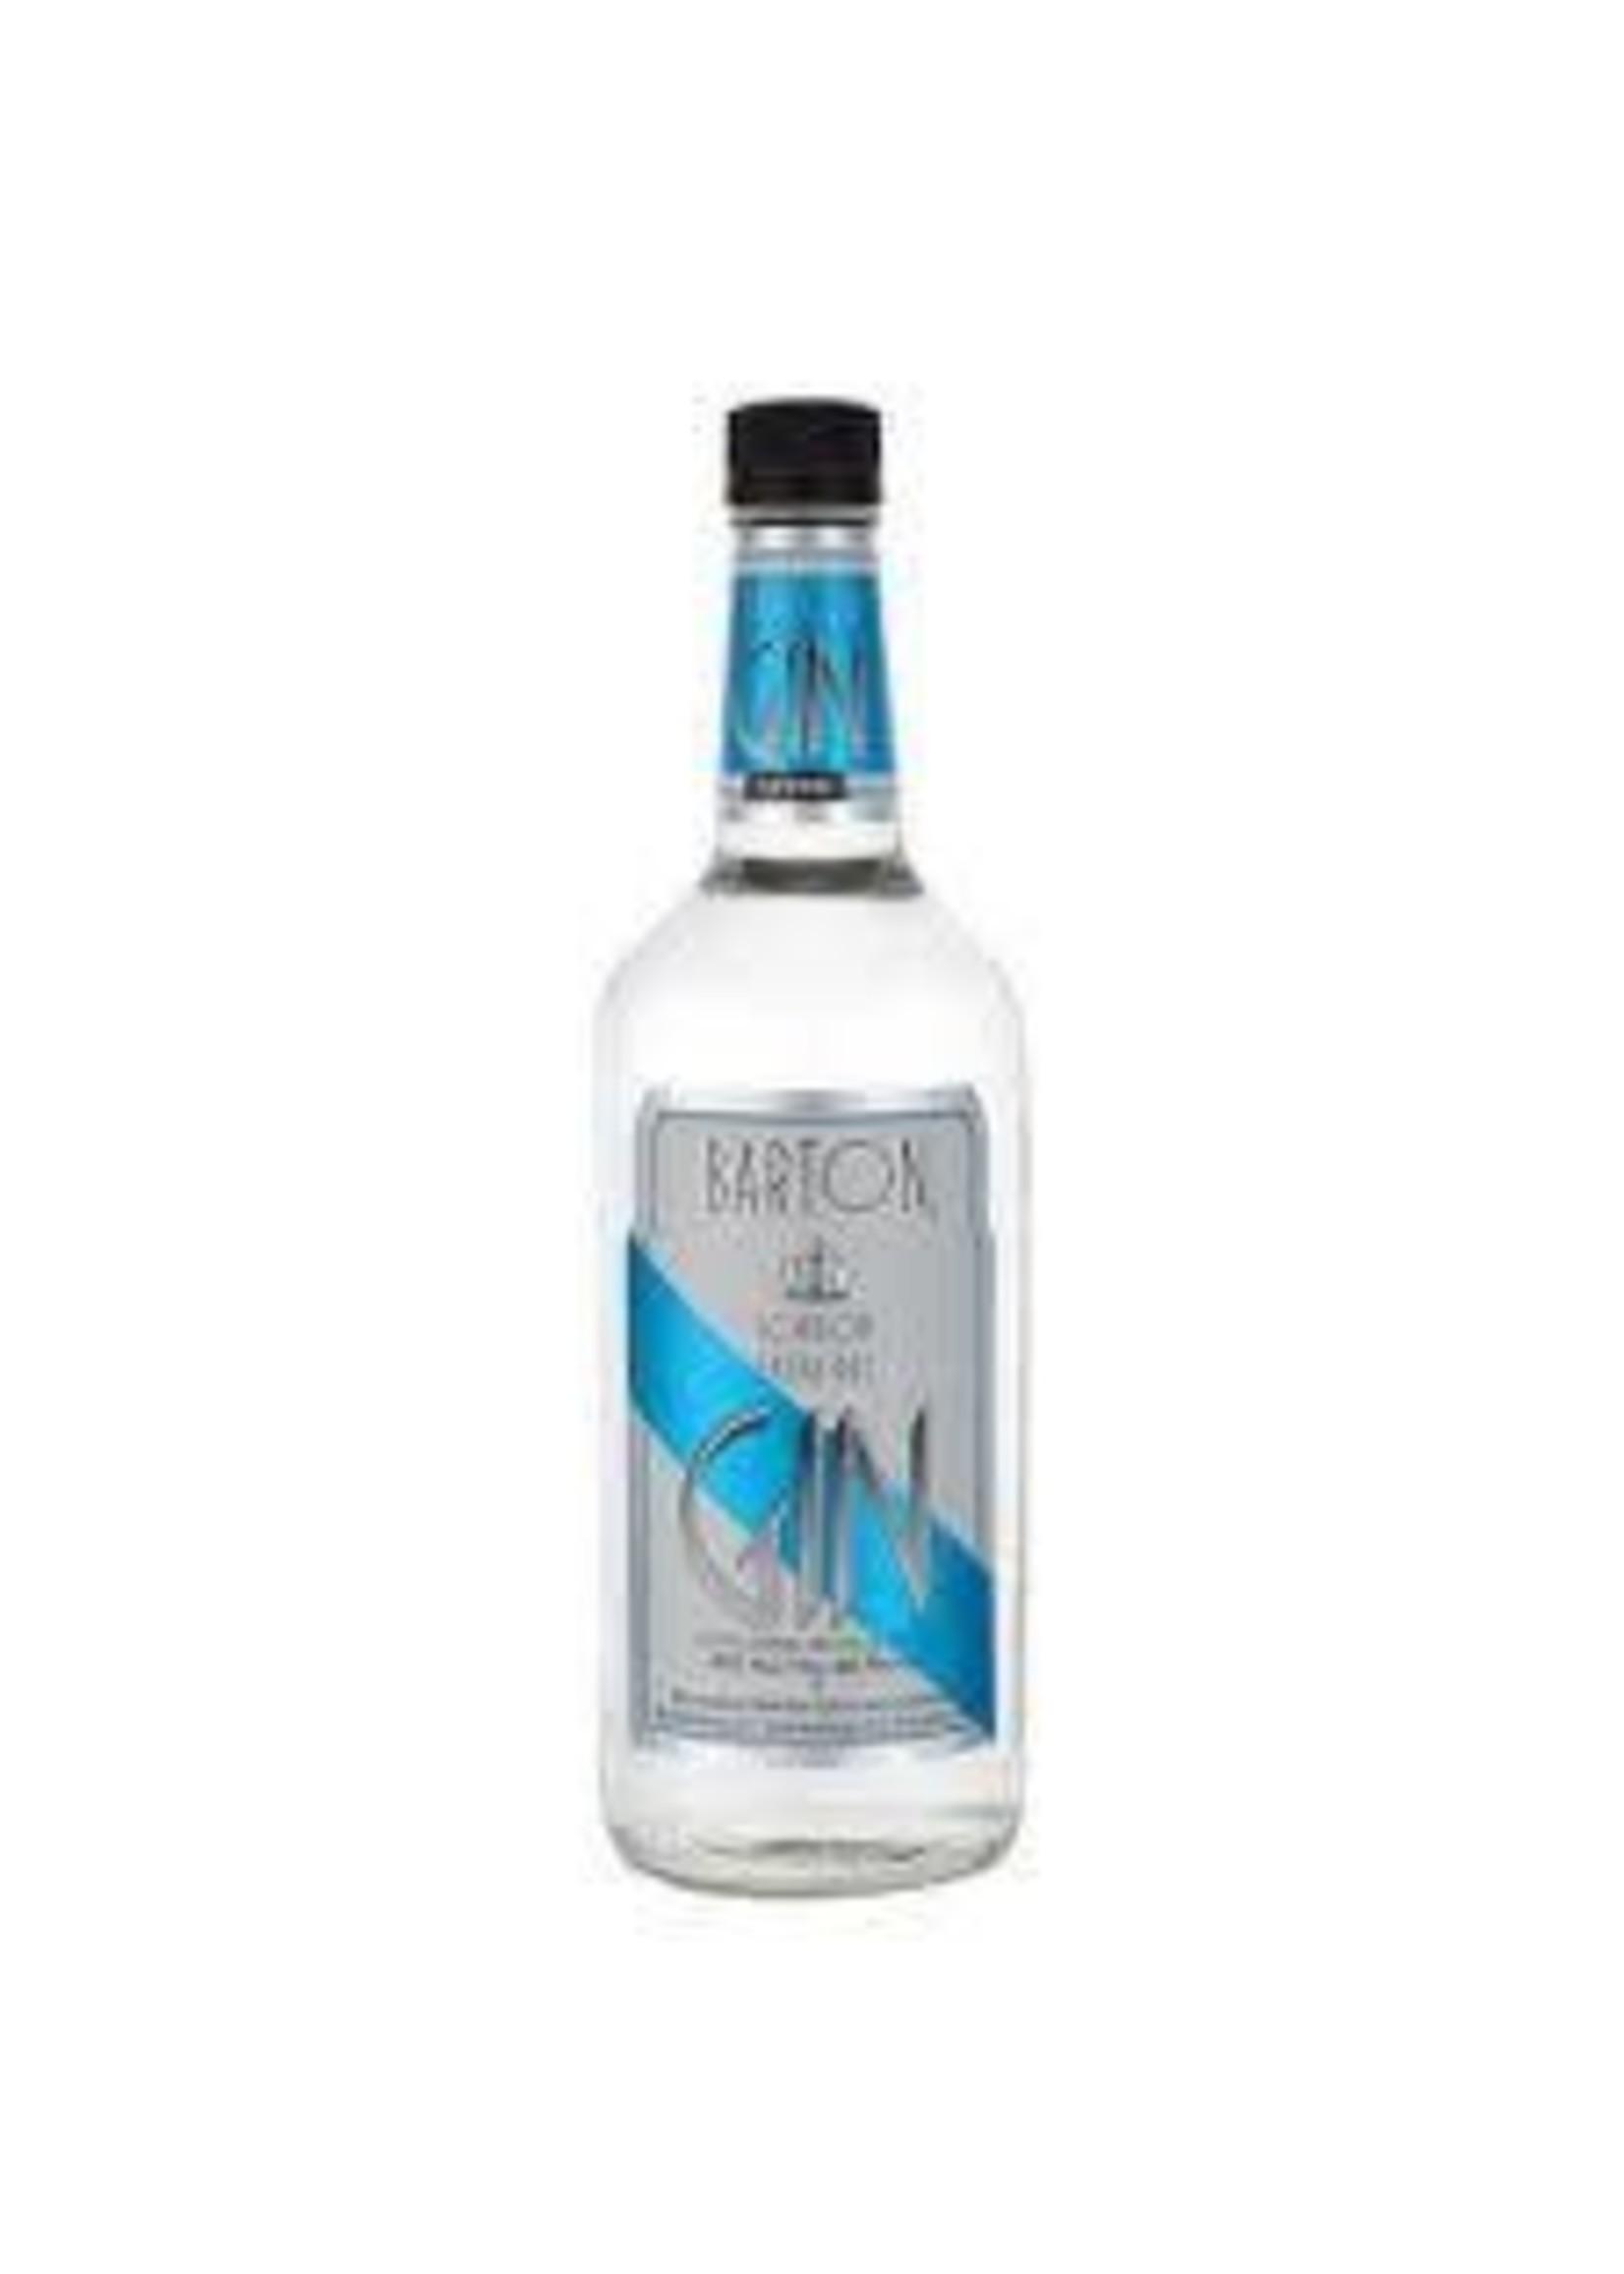 Barton Barton / Gin